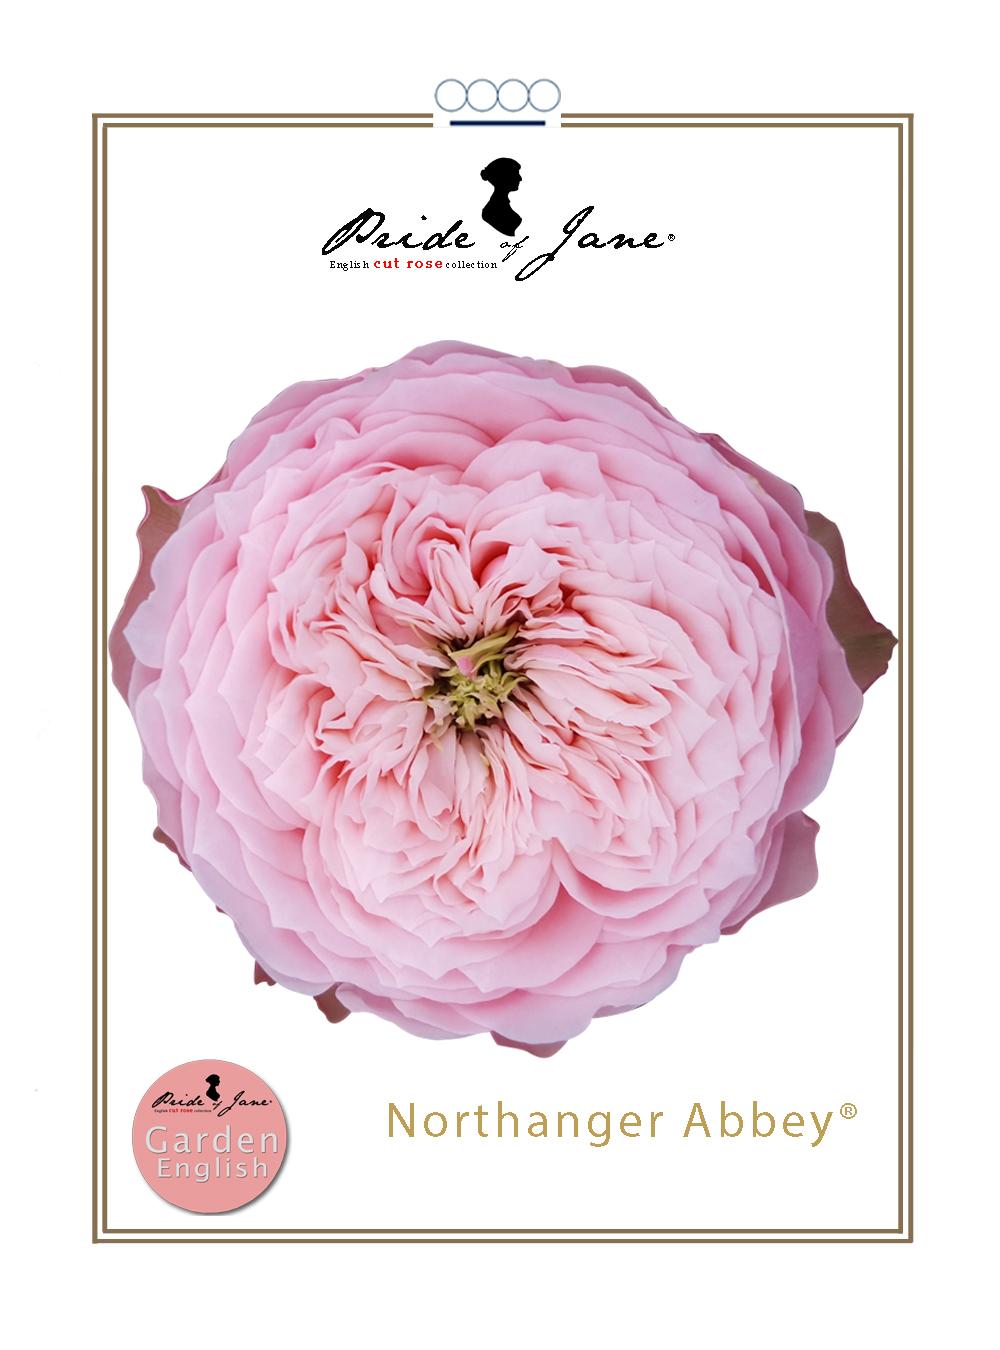 Northanger Abbey®